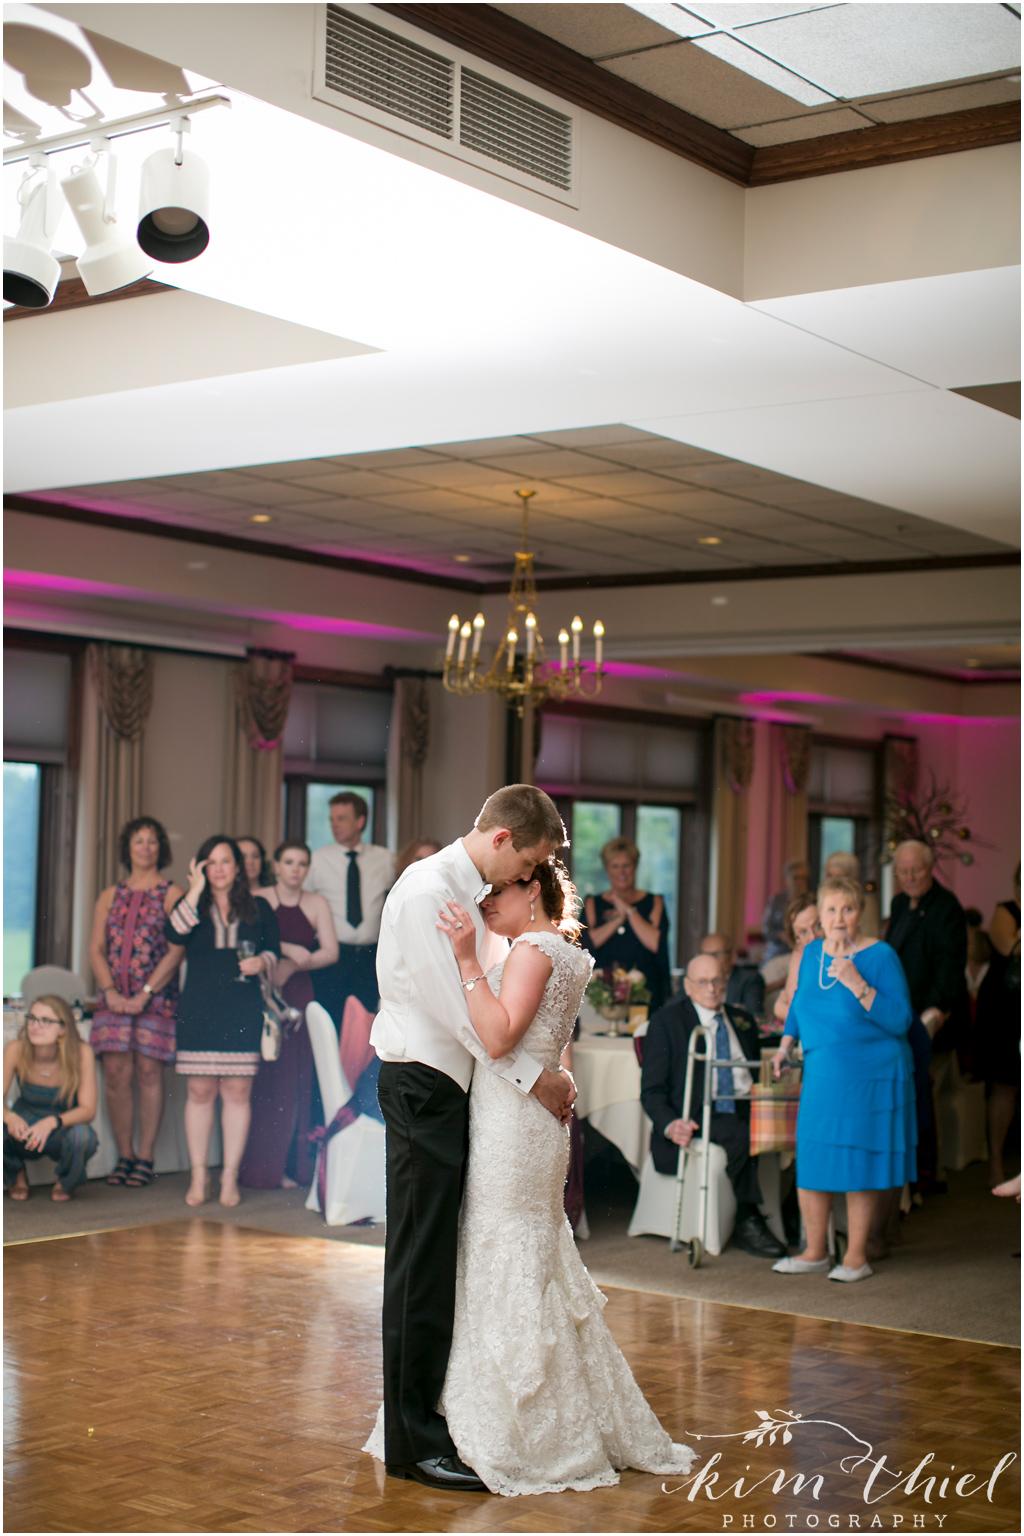 Kim-Thiel-Photography-Butte-Des-Morts-Country-Club-Wedding-52